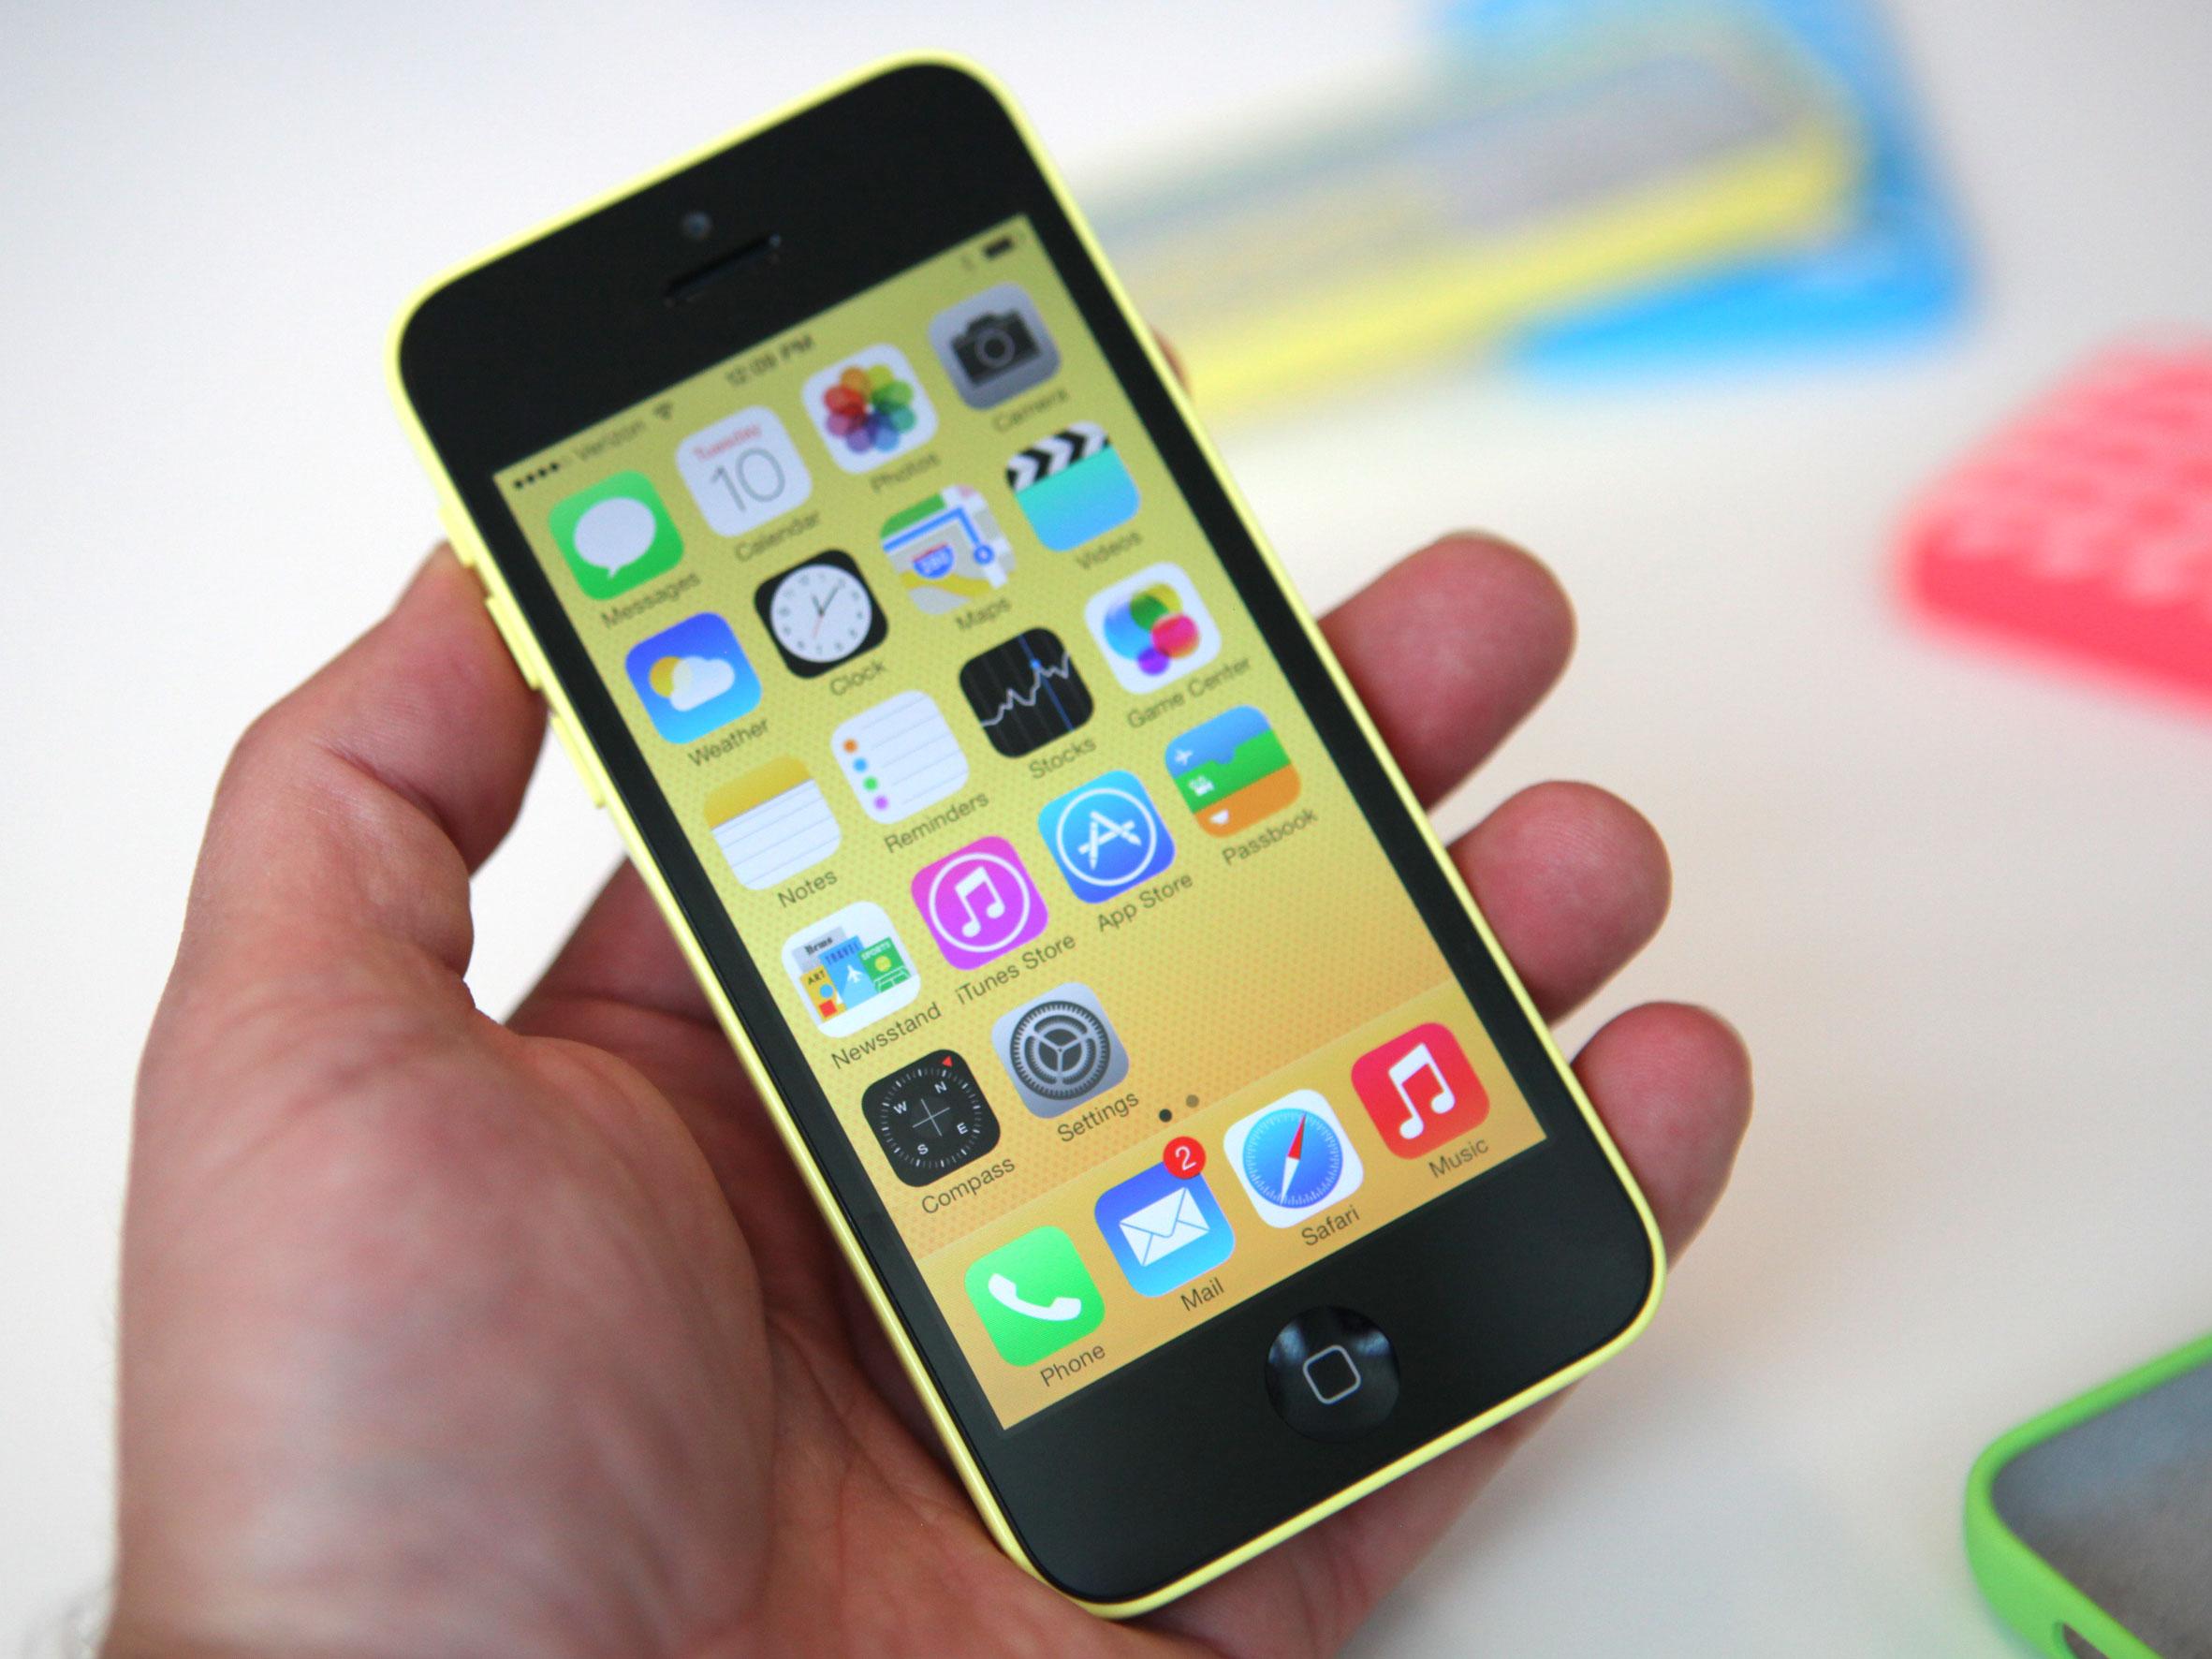 iPhone 5C with iOS 7